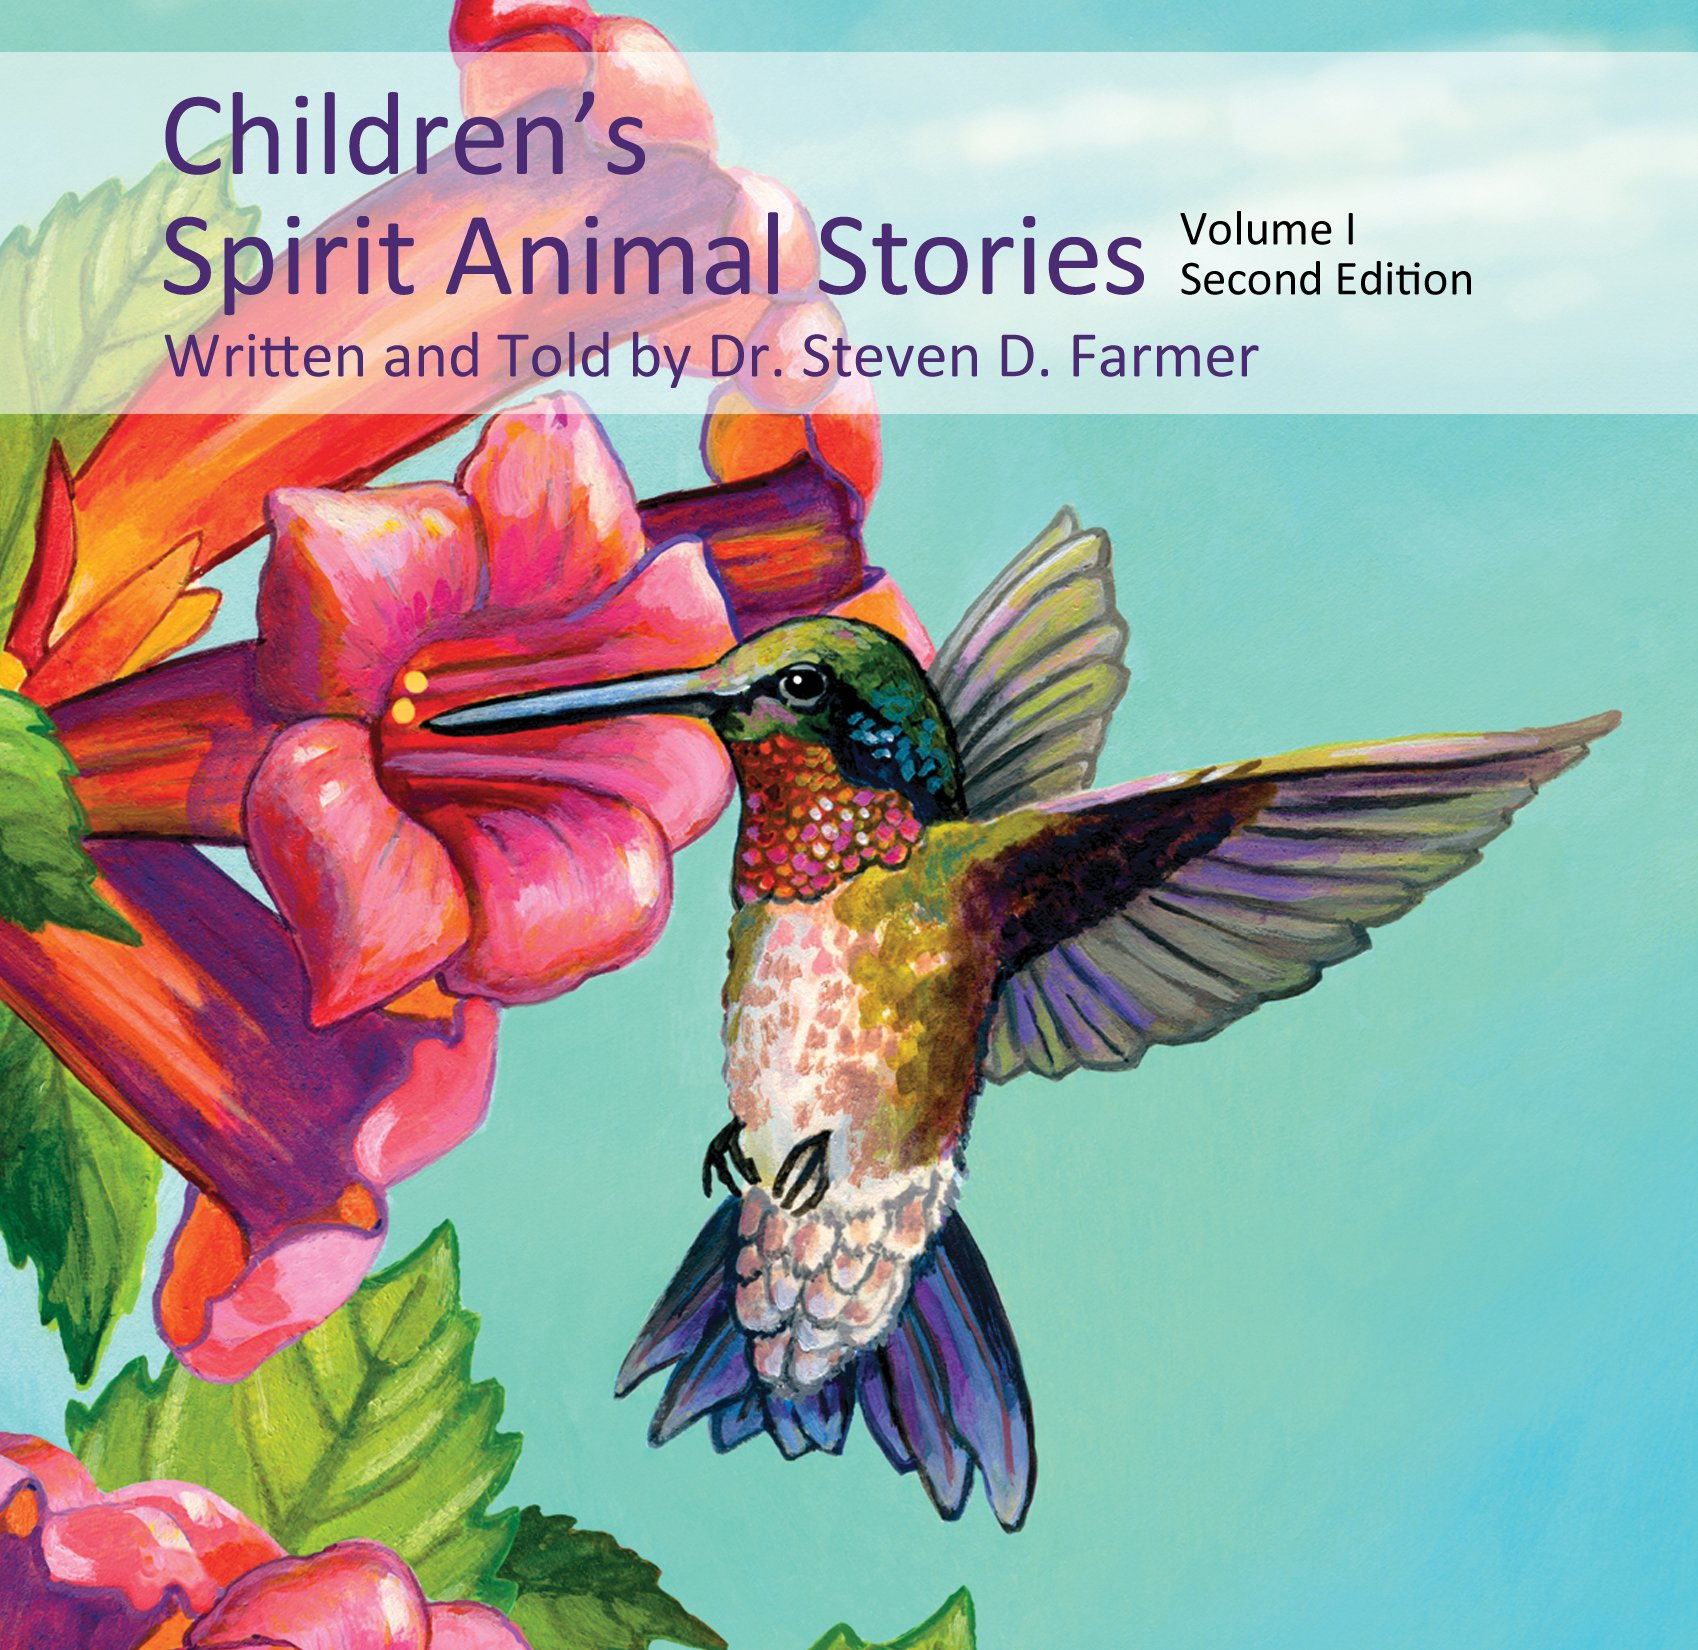 Children's Spirit Animal Stories Vol I Second Edition